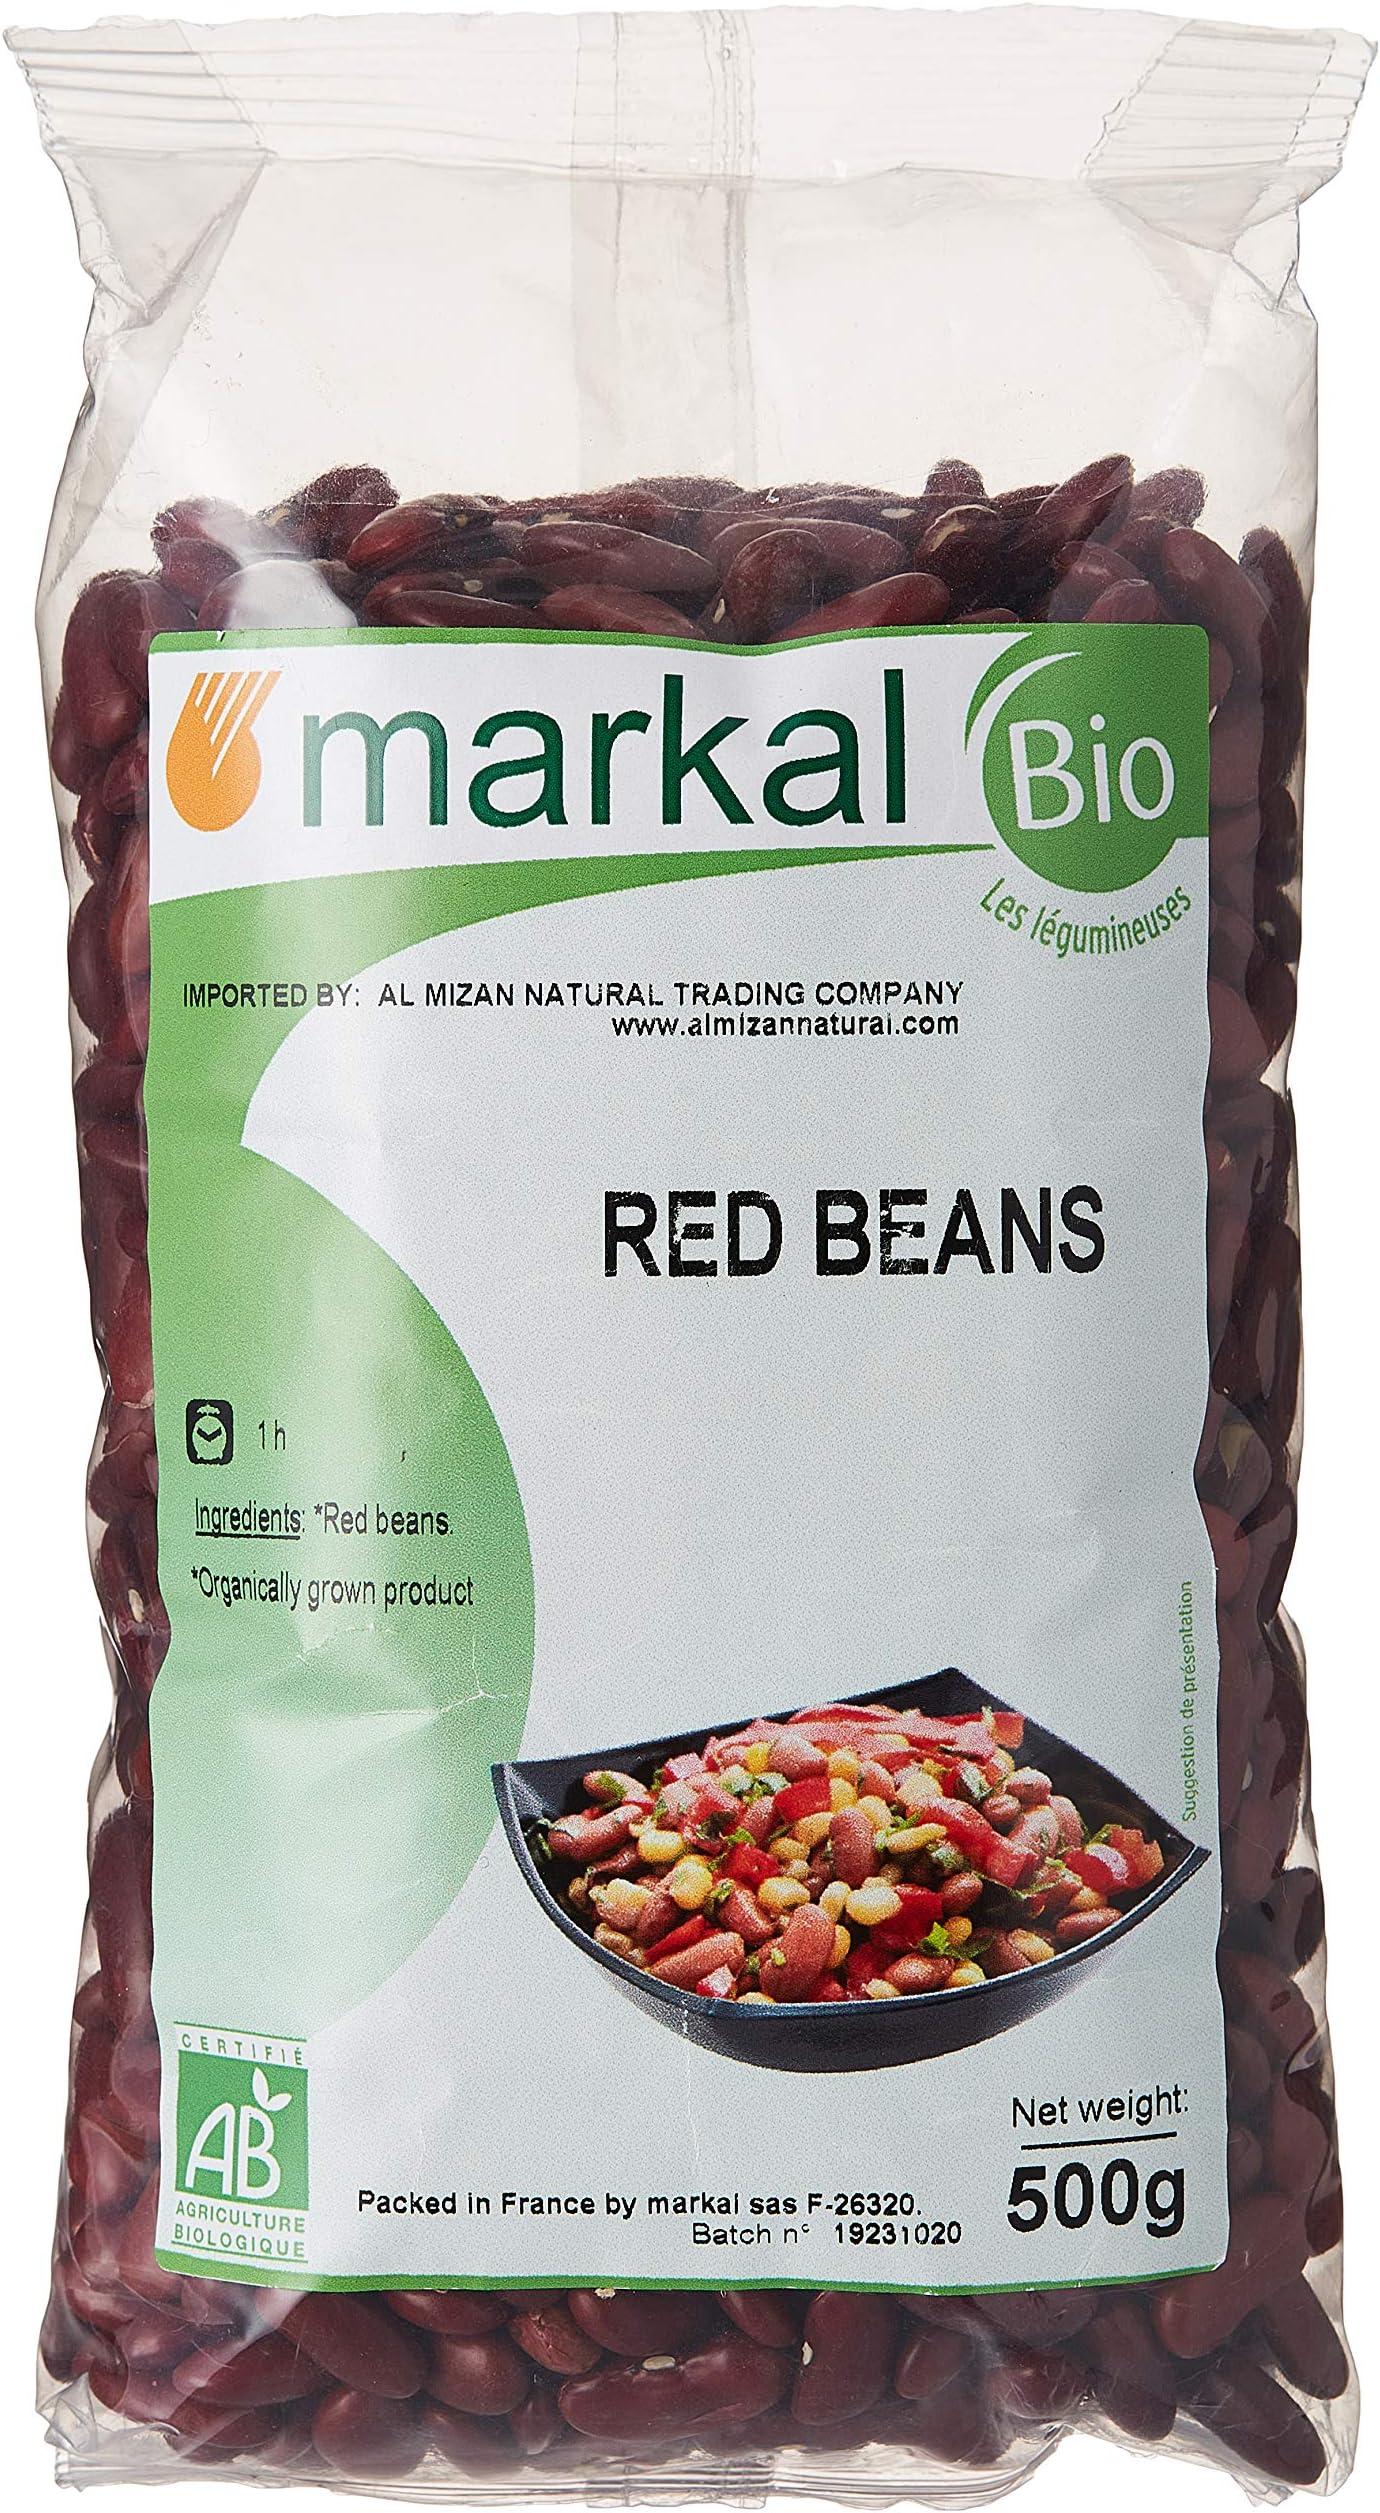 Organic Red Kidney Beans By Markal 500gm Price In Saudi Arabia Amazon Saudi Arabia Kanbkam